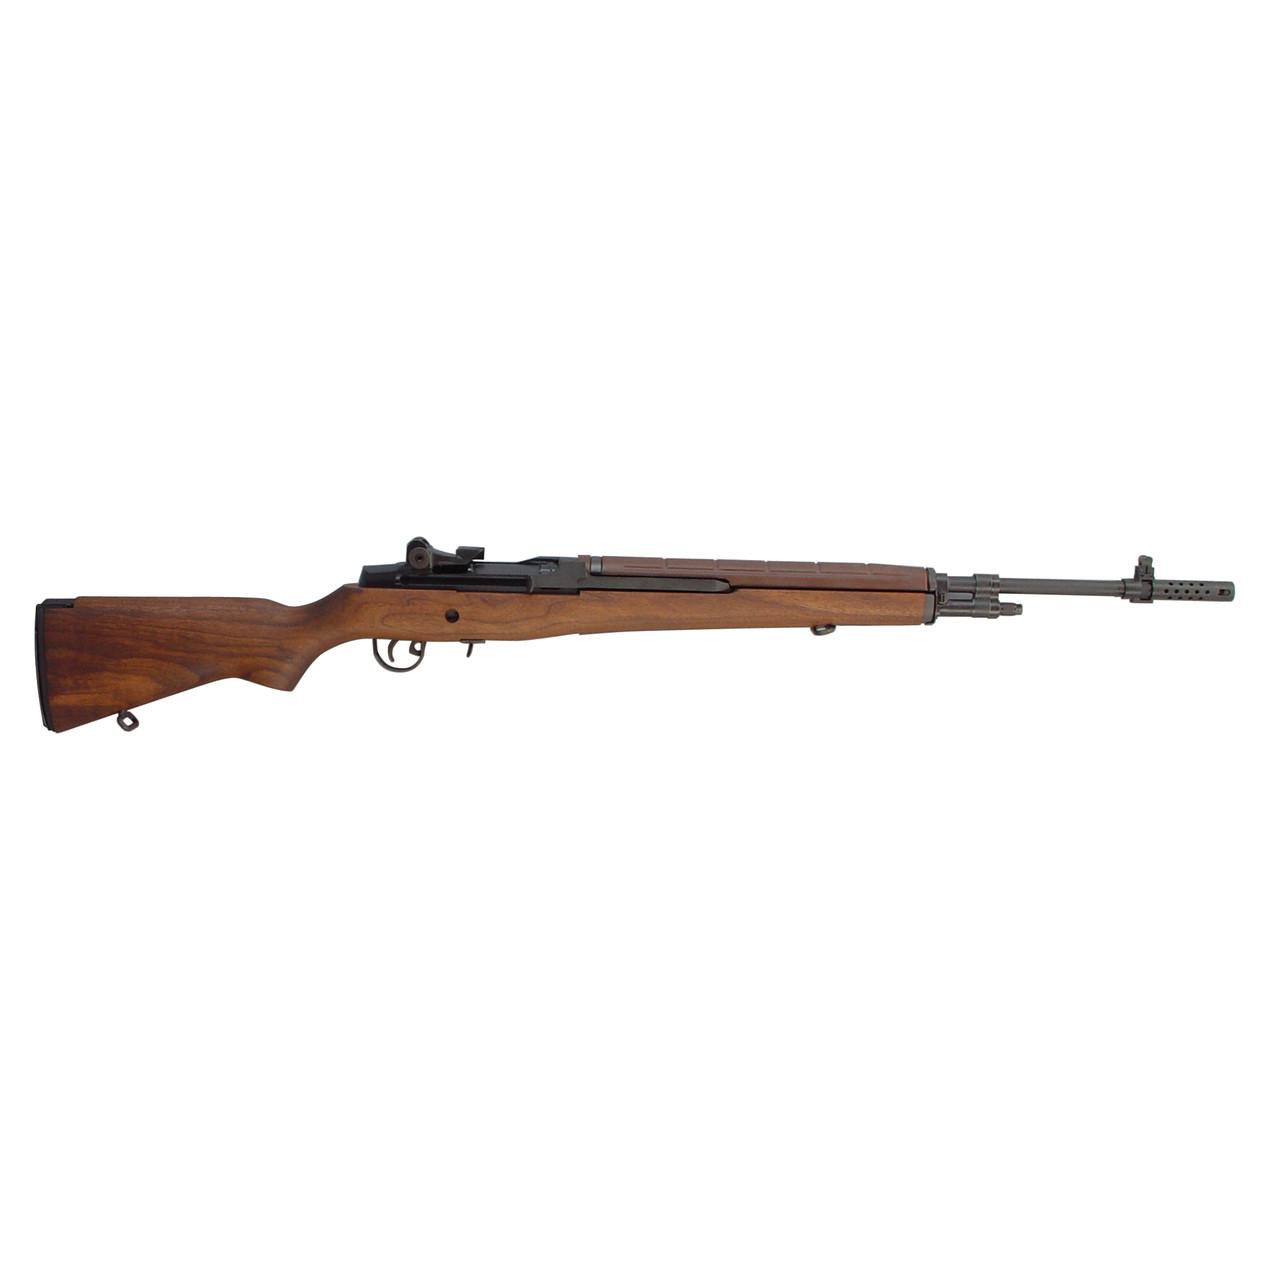 Springfield M1A Standard W/Muzzle Brake CALIFORNIA LEGAL - .308 - Walnut